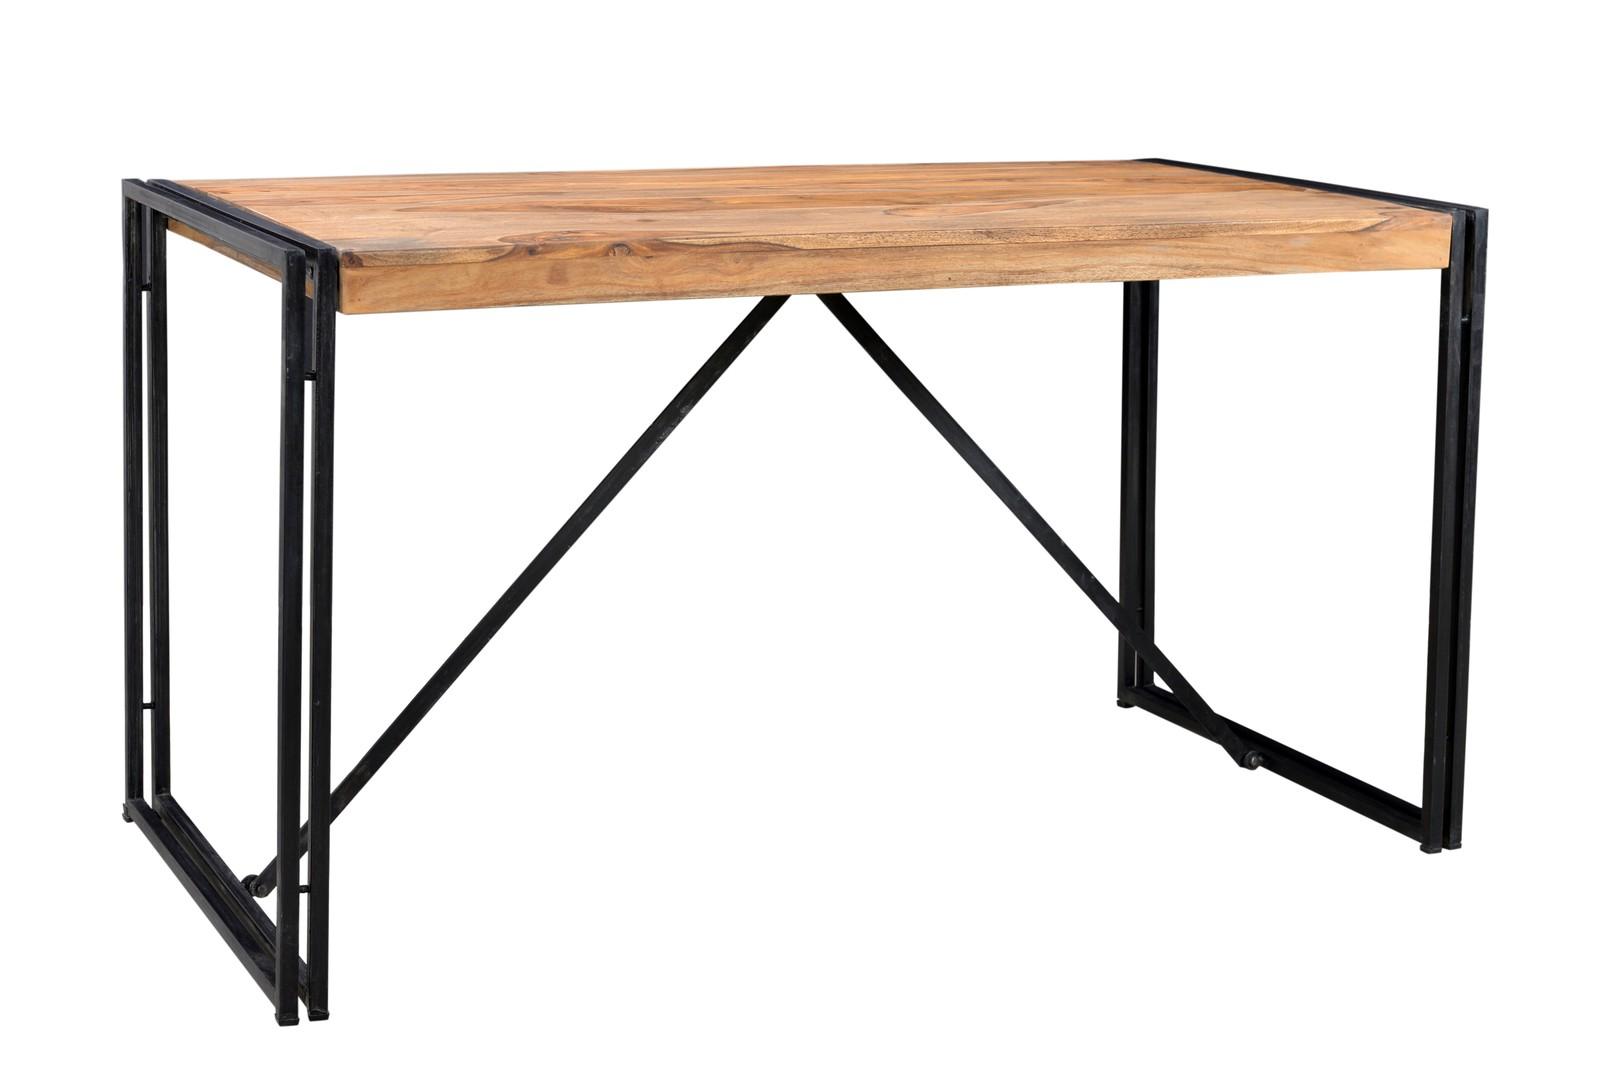 PANAMA Tisch